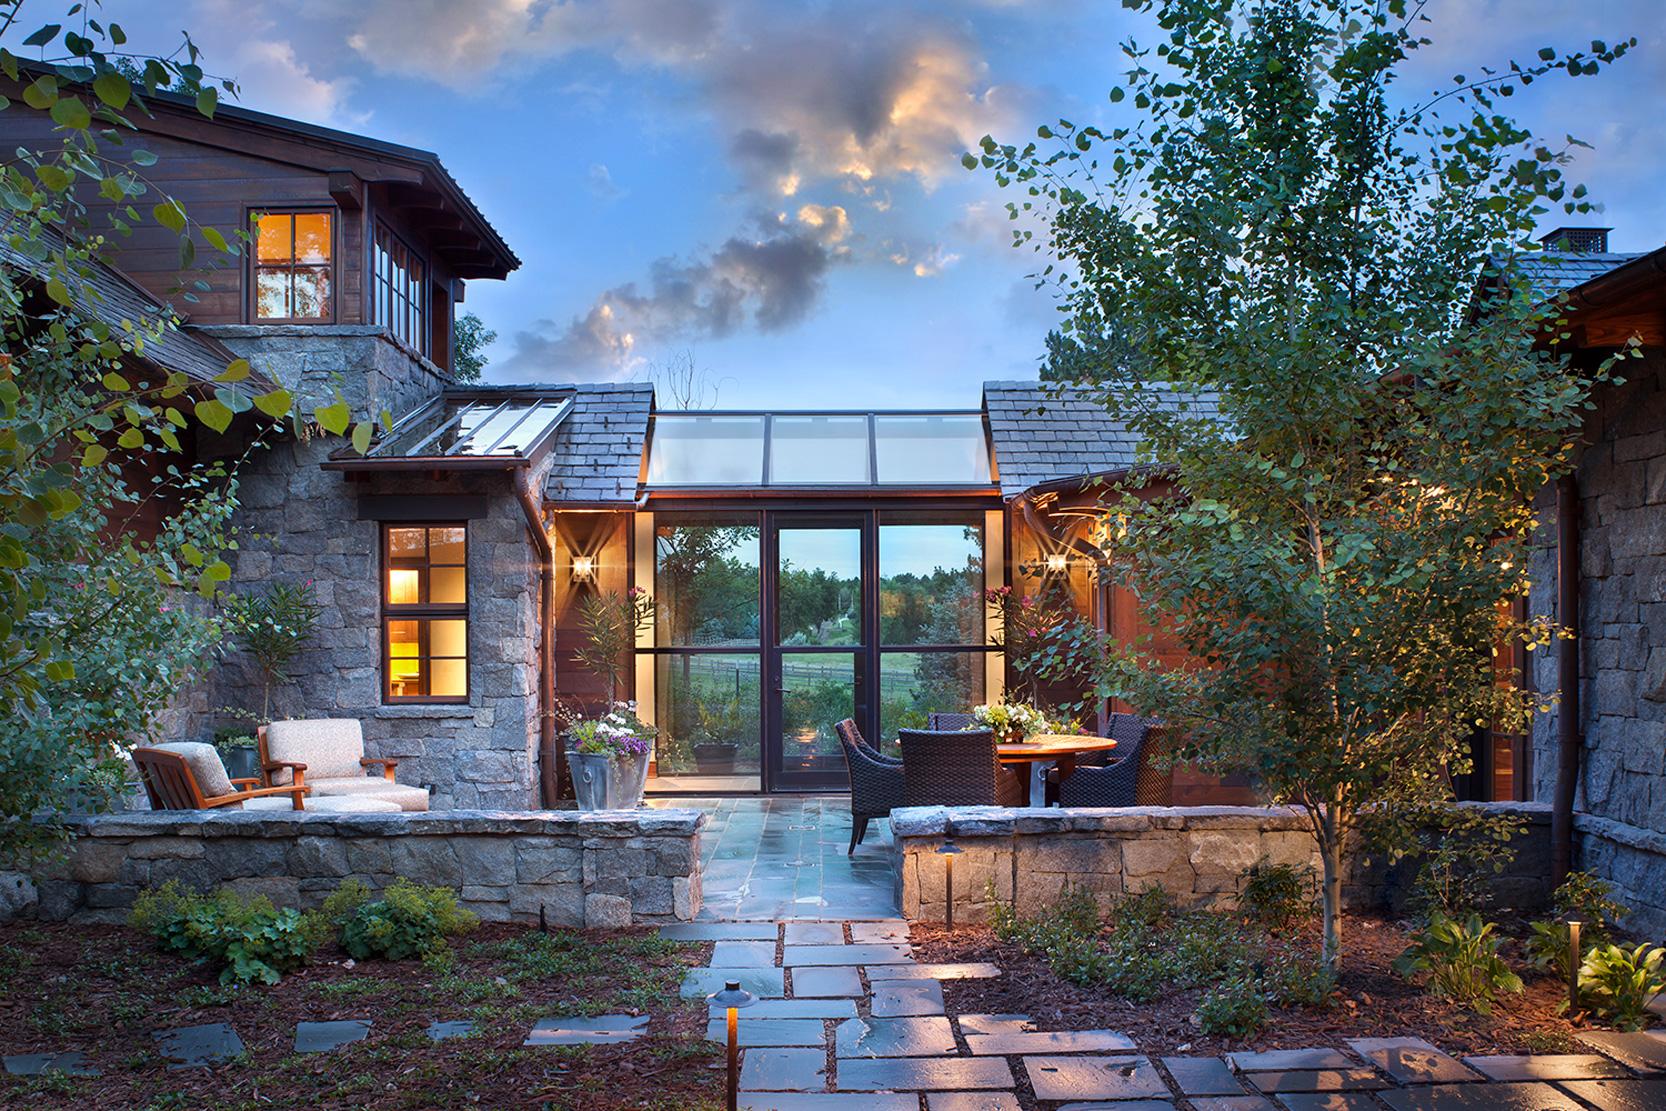 Caribou, Cherry Hills Village, Denver, Colorado